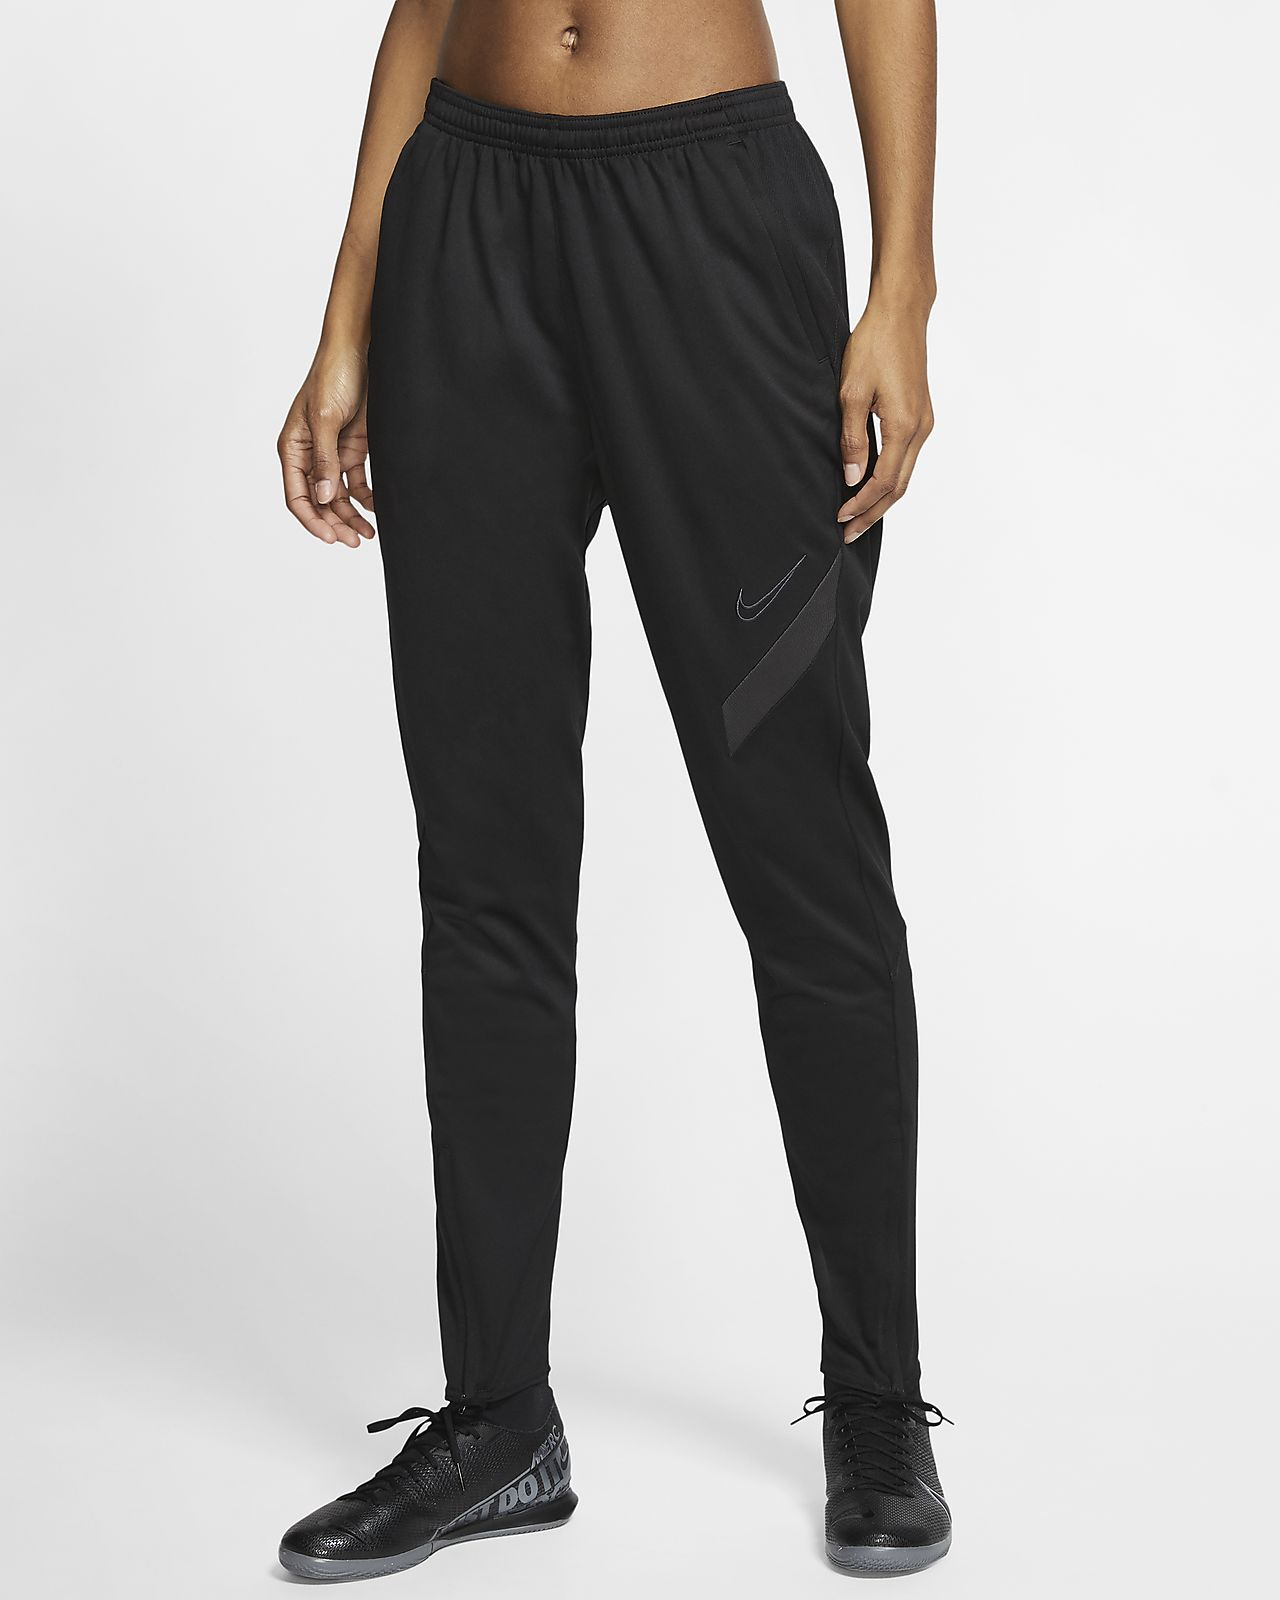 Nike Dri-FIT Academy Pro Women's Soccer Pants